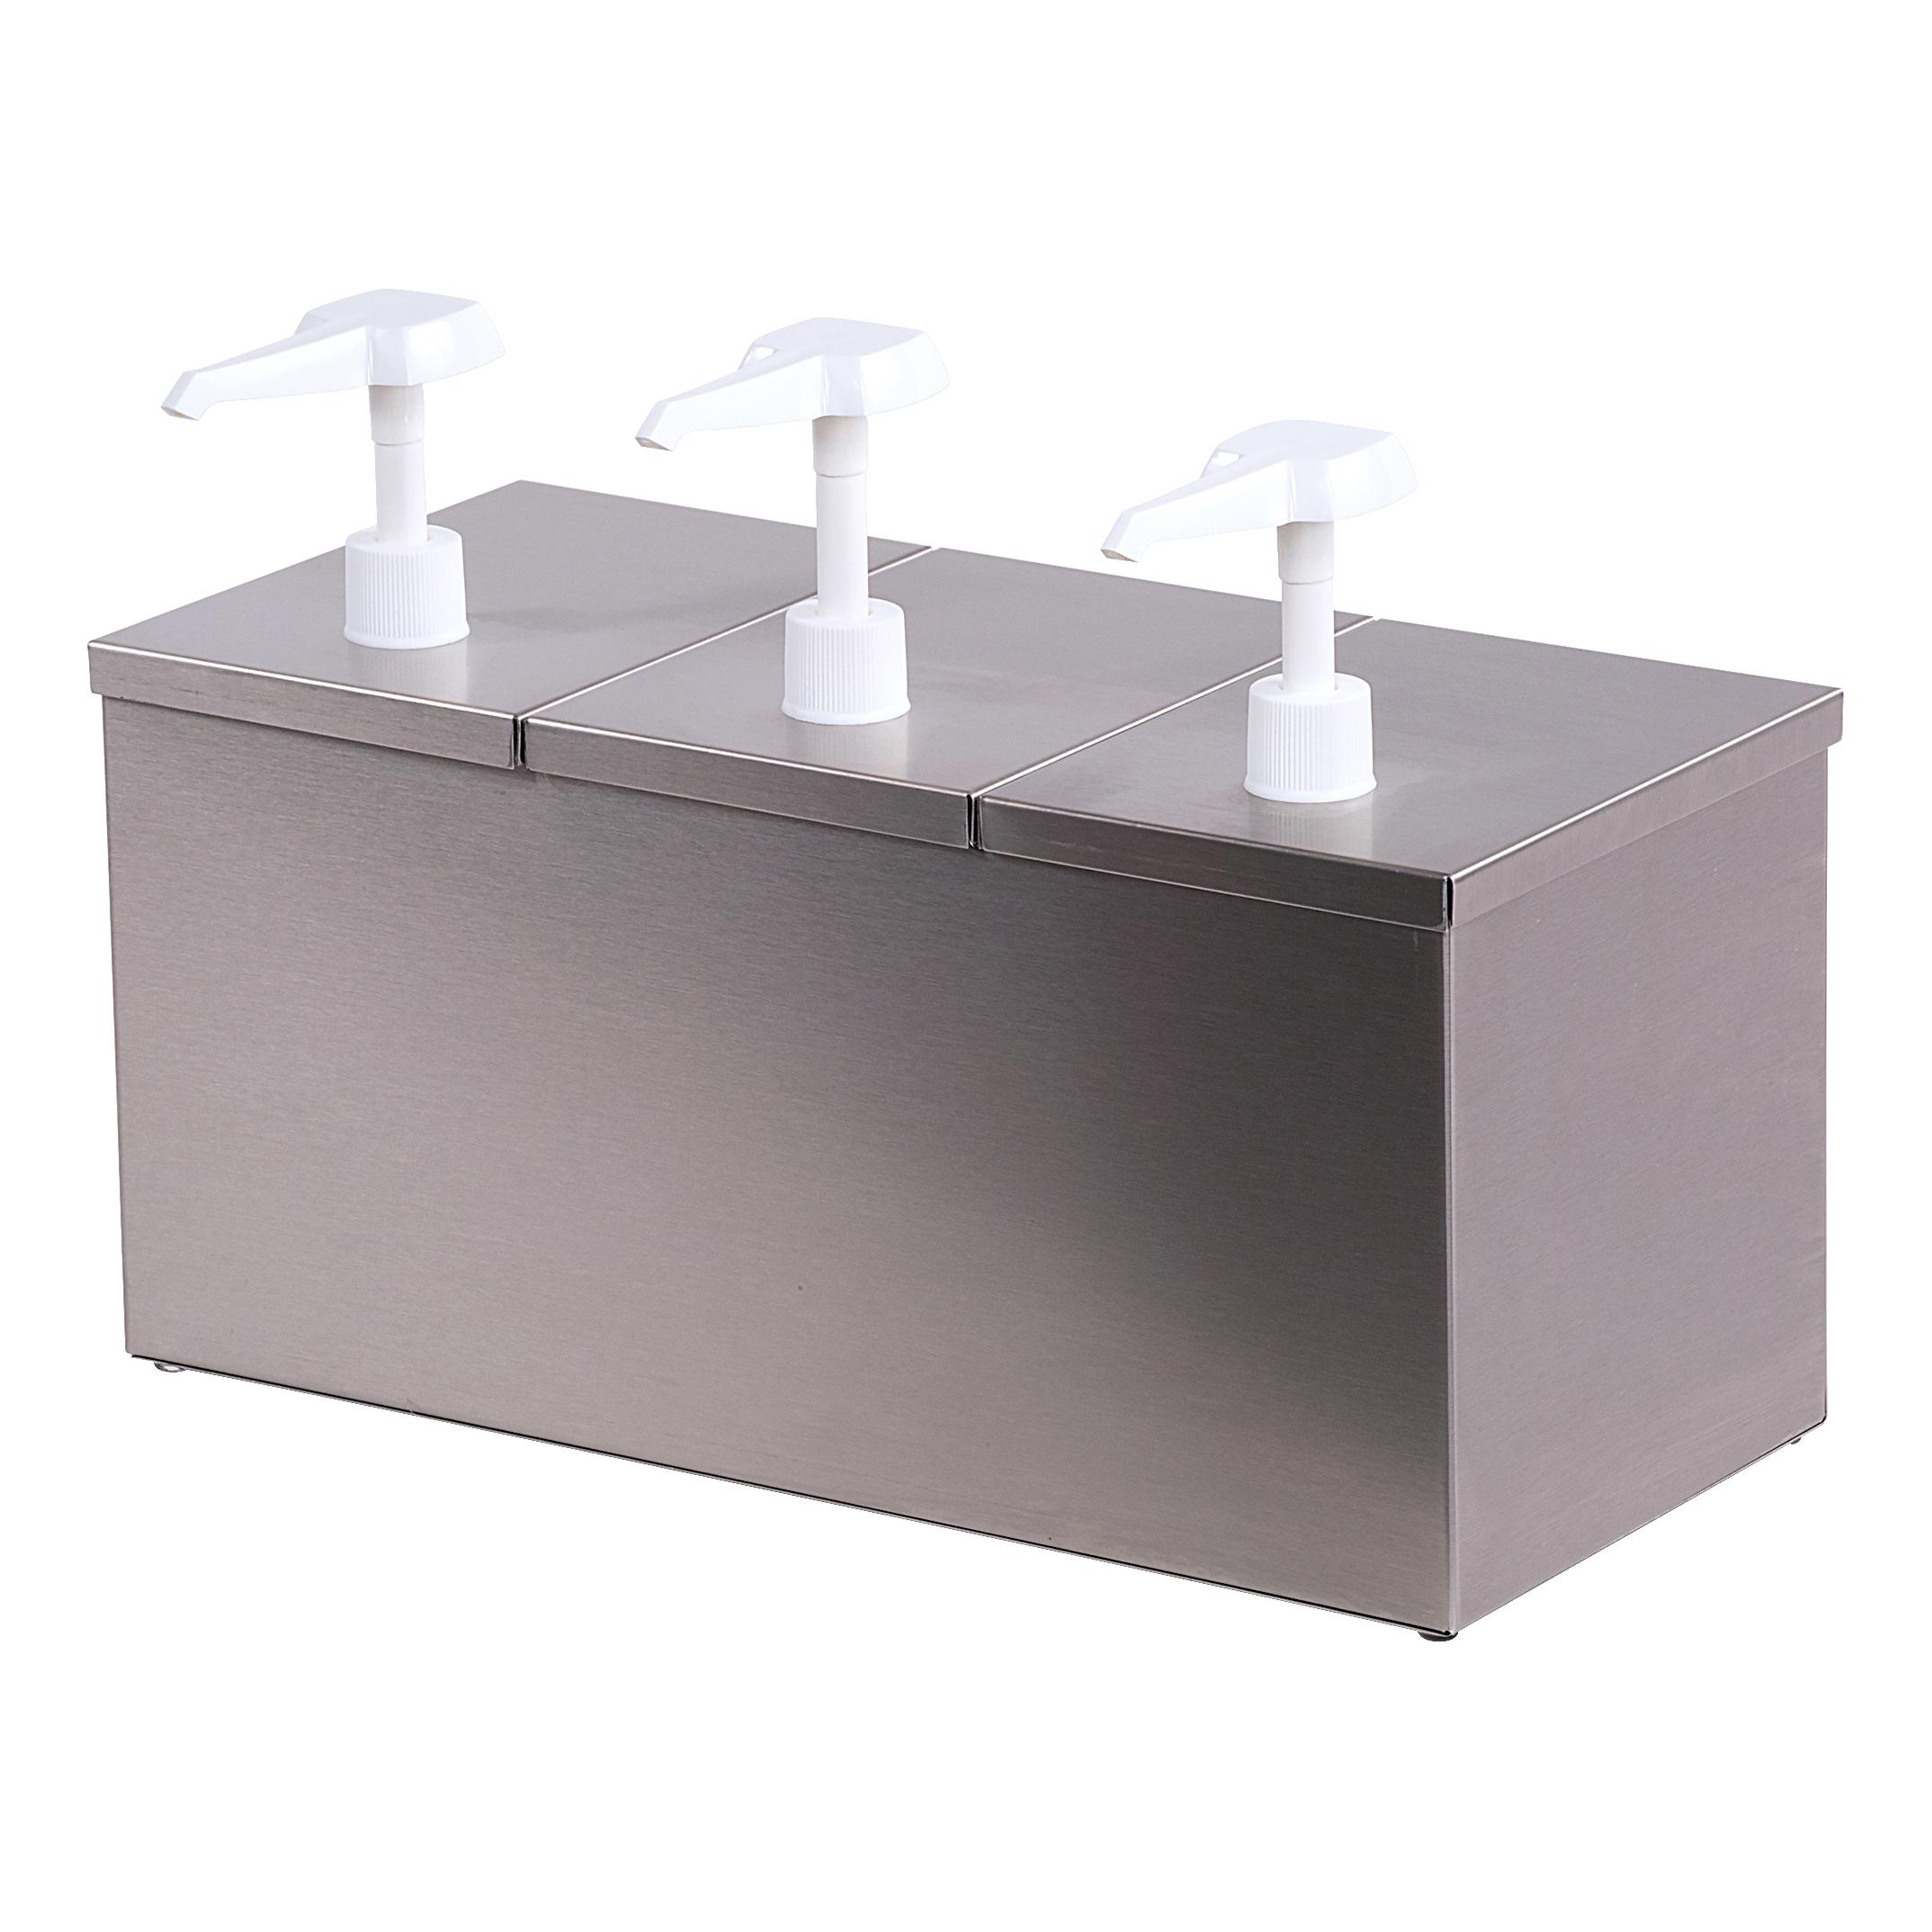 Carlisle 38623IB condiment dispenser pump-style